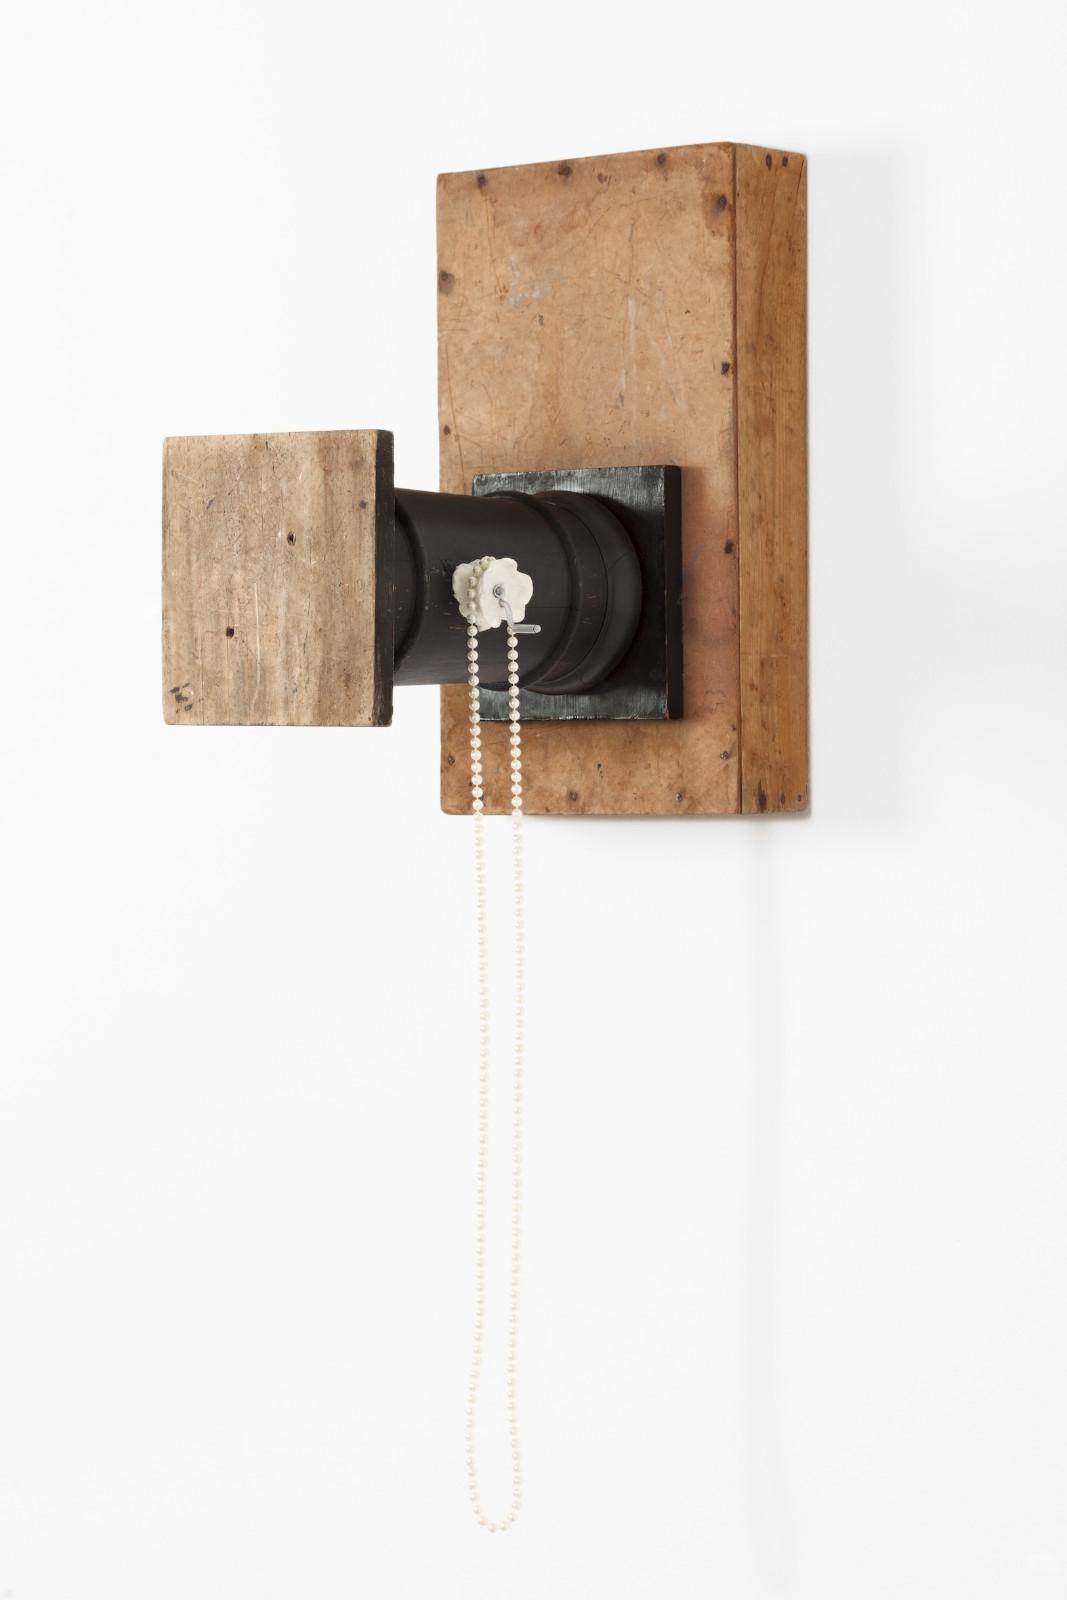 De Profundis X (piedestal), 2013, mixed media, 110 x 31 x 49,5 cm